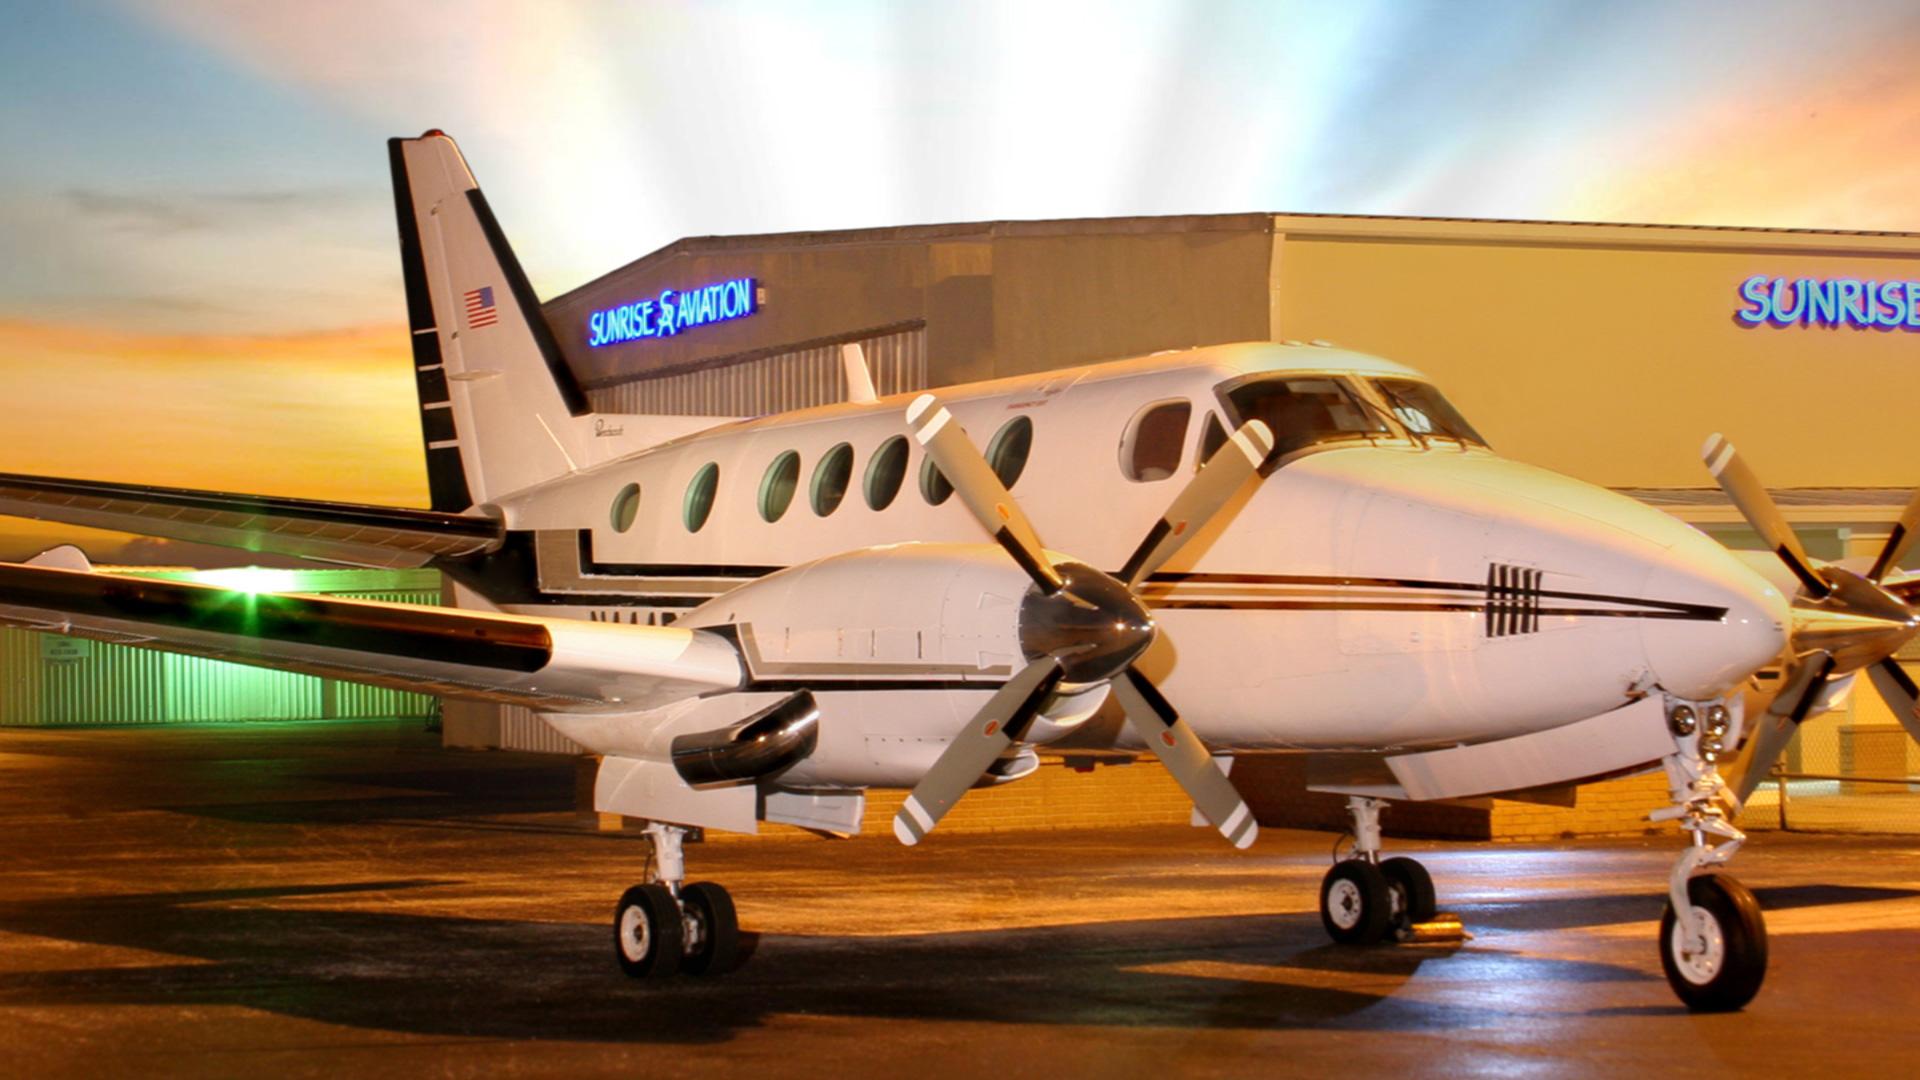 Sunrise flight Academy king air